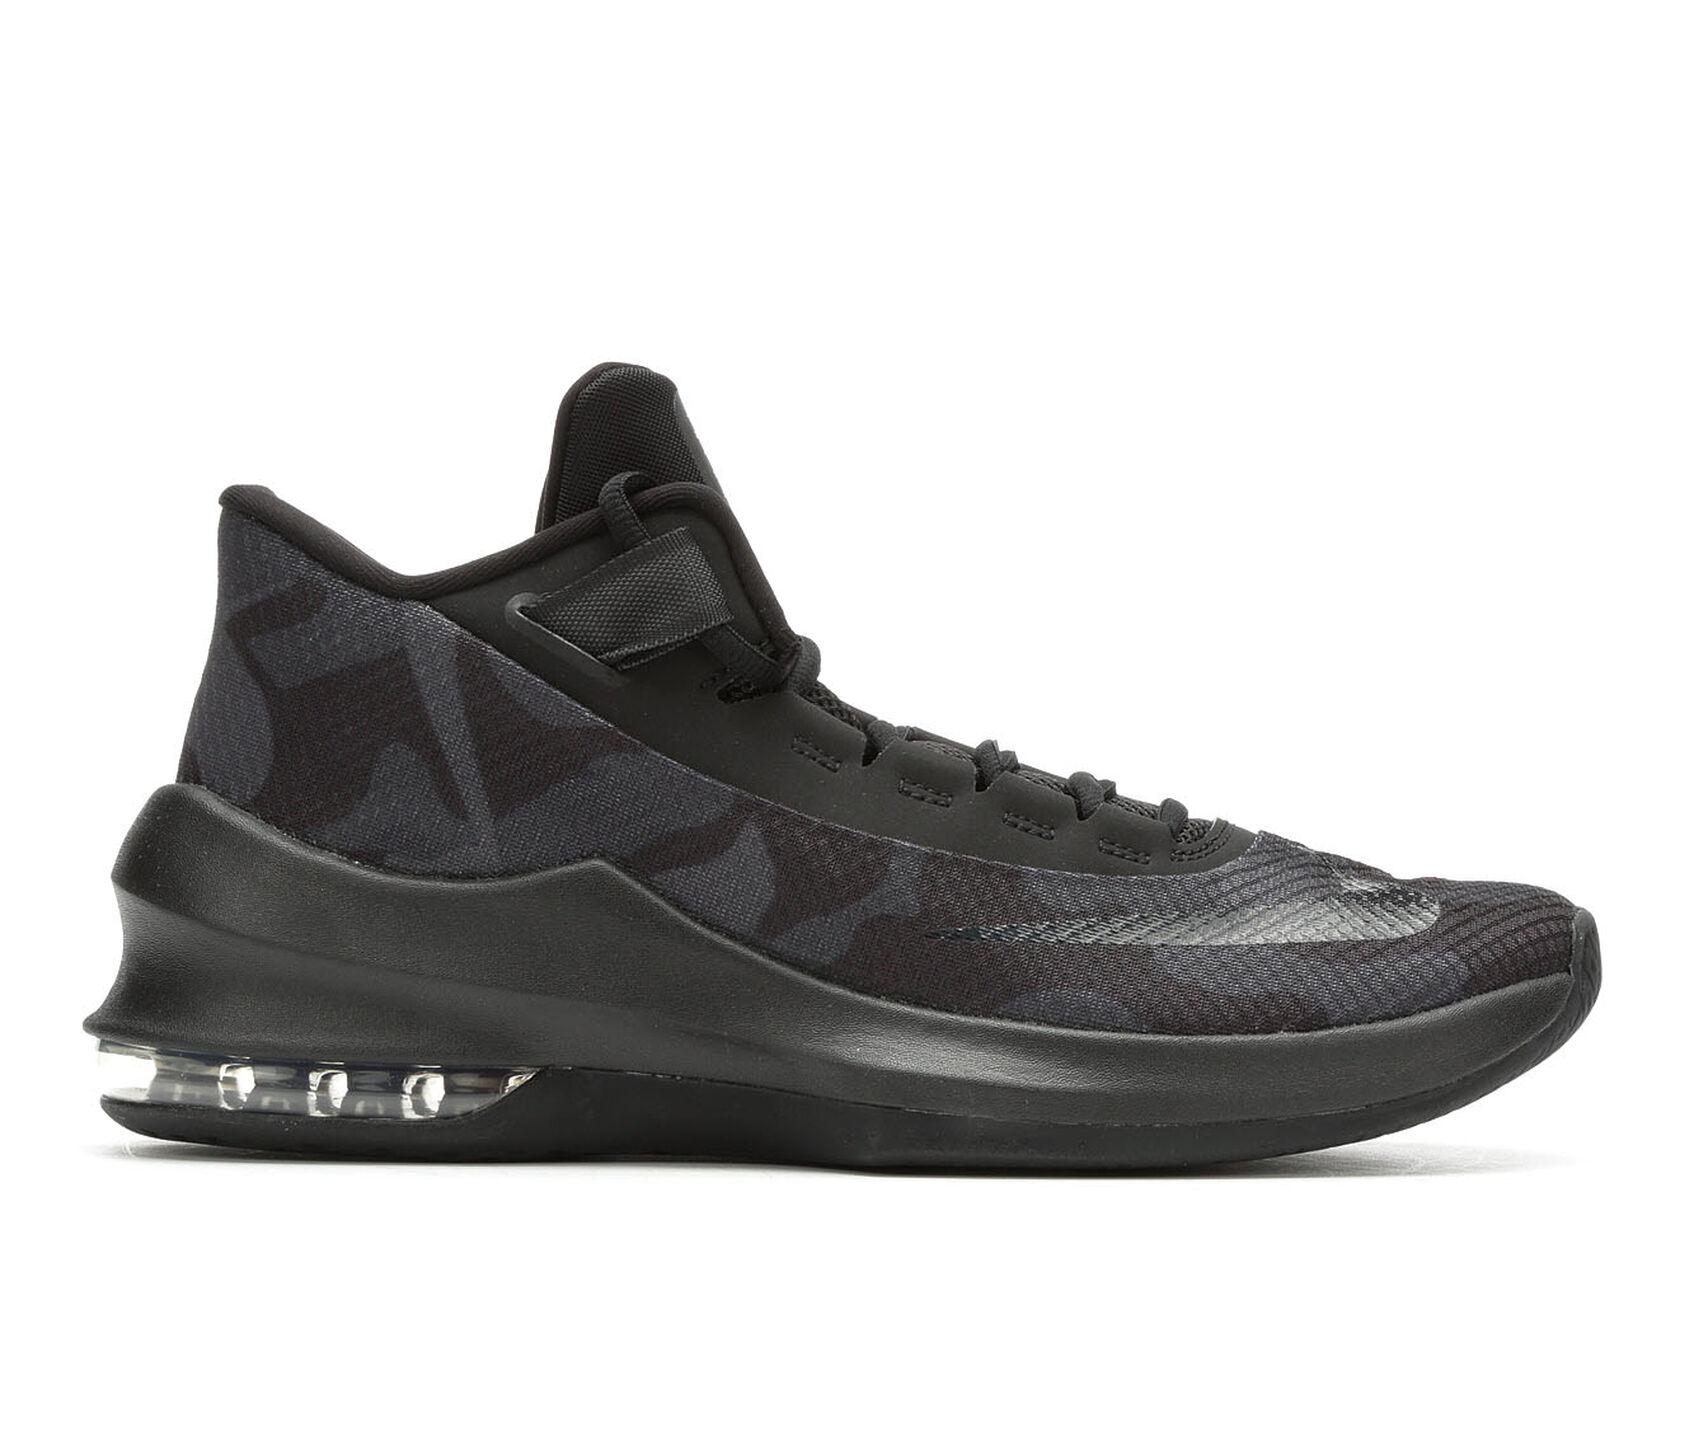 13c0844597 Men's Nike Air Max Infuriate II Mid Premium Basketball Shoes | Shoe ...